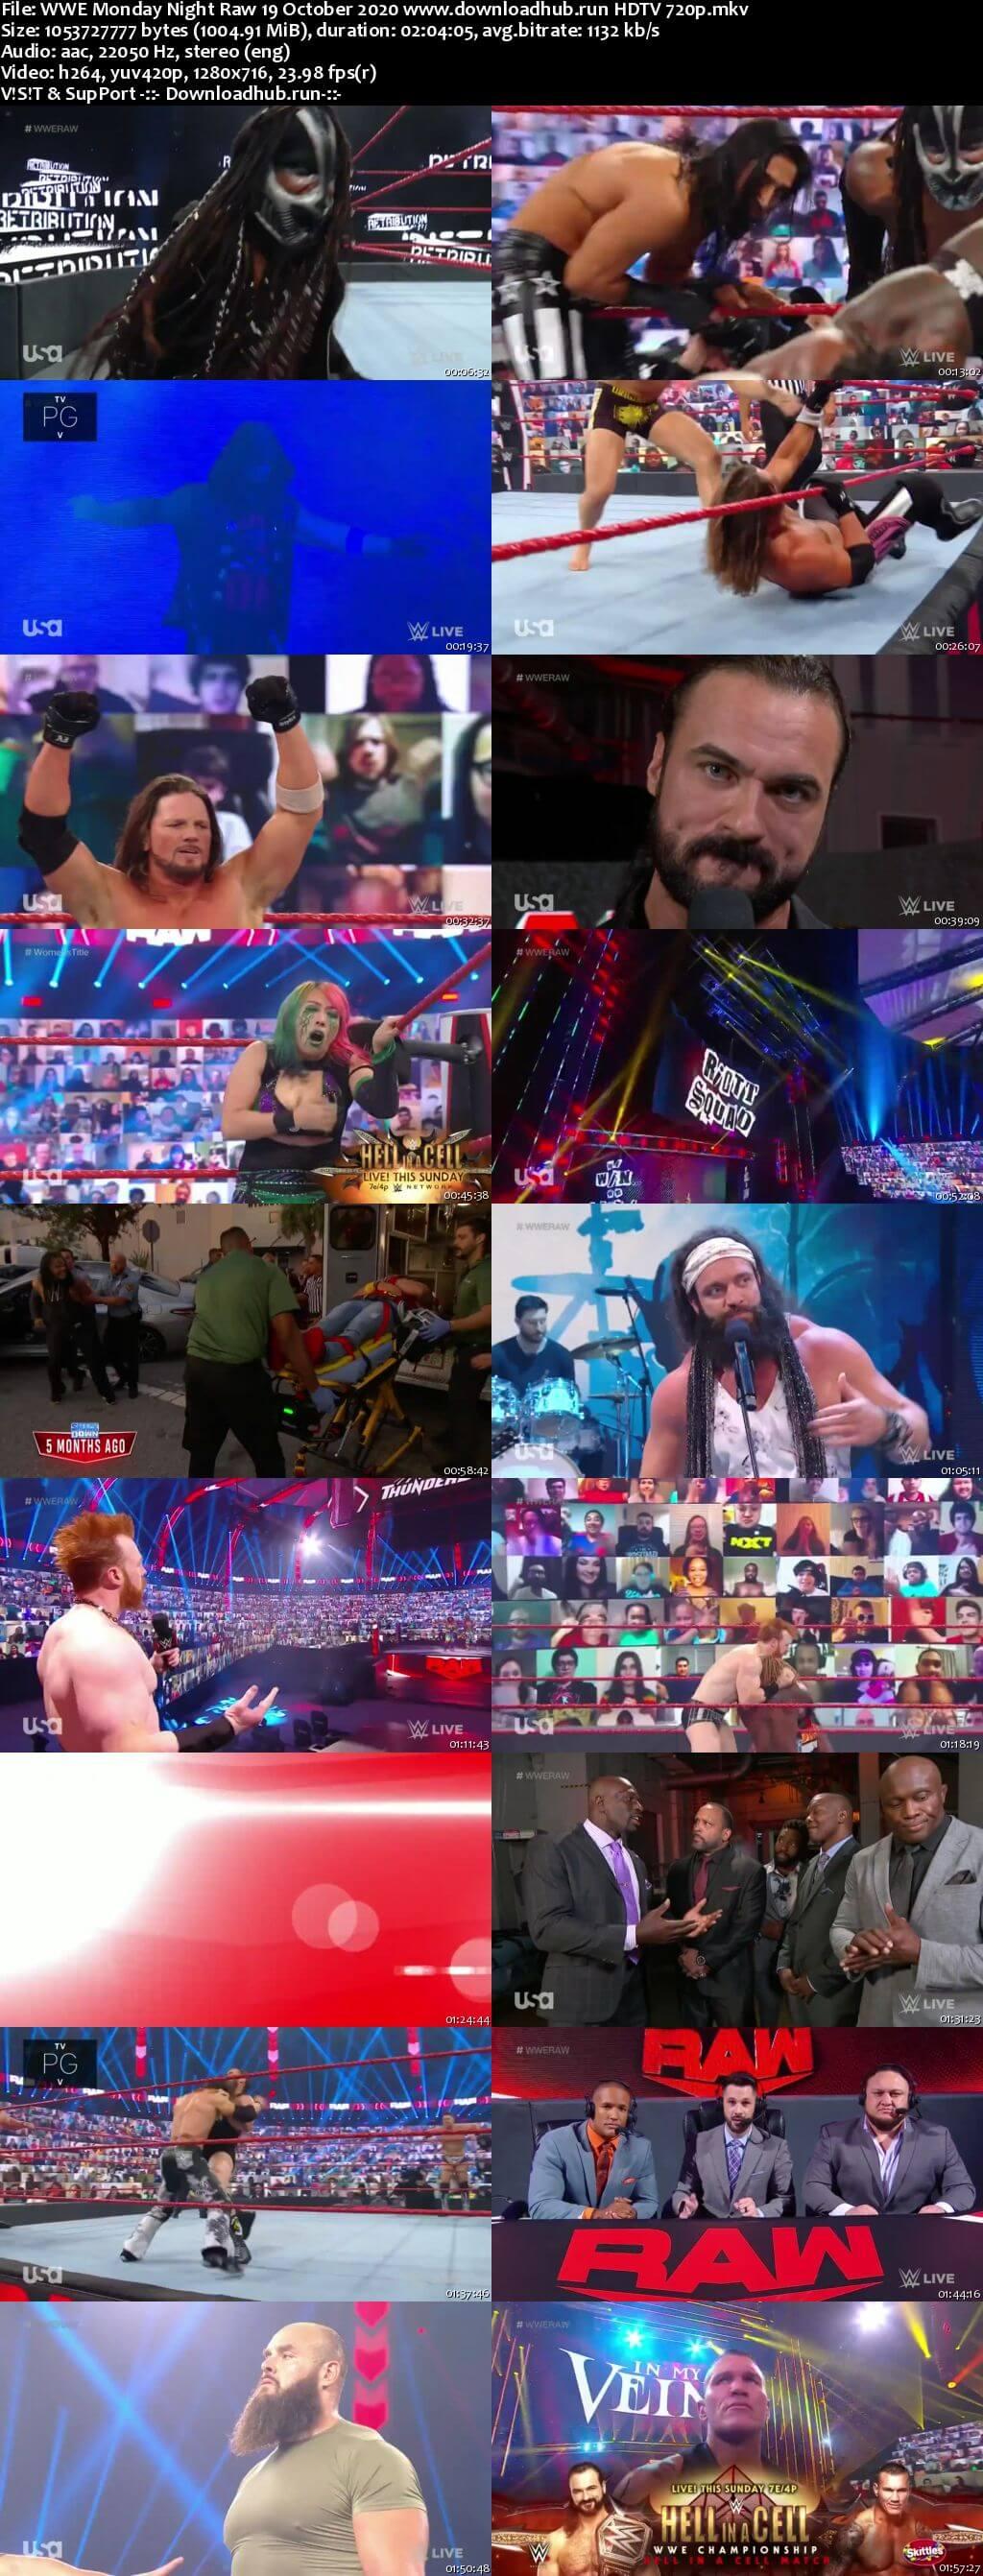 WWE Monday Night Raw 19th October 2020 720p 500MB HDTVRip 480p